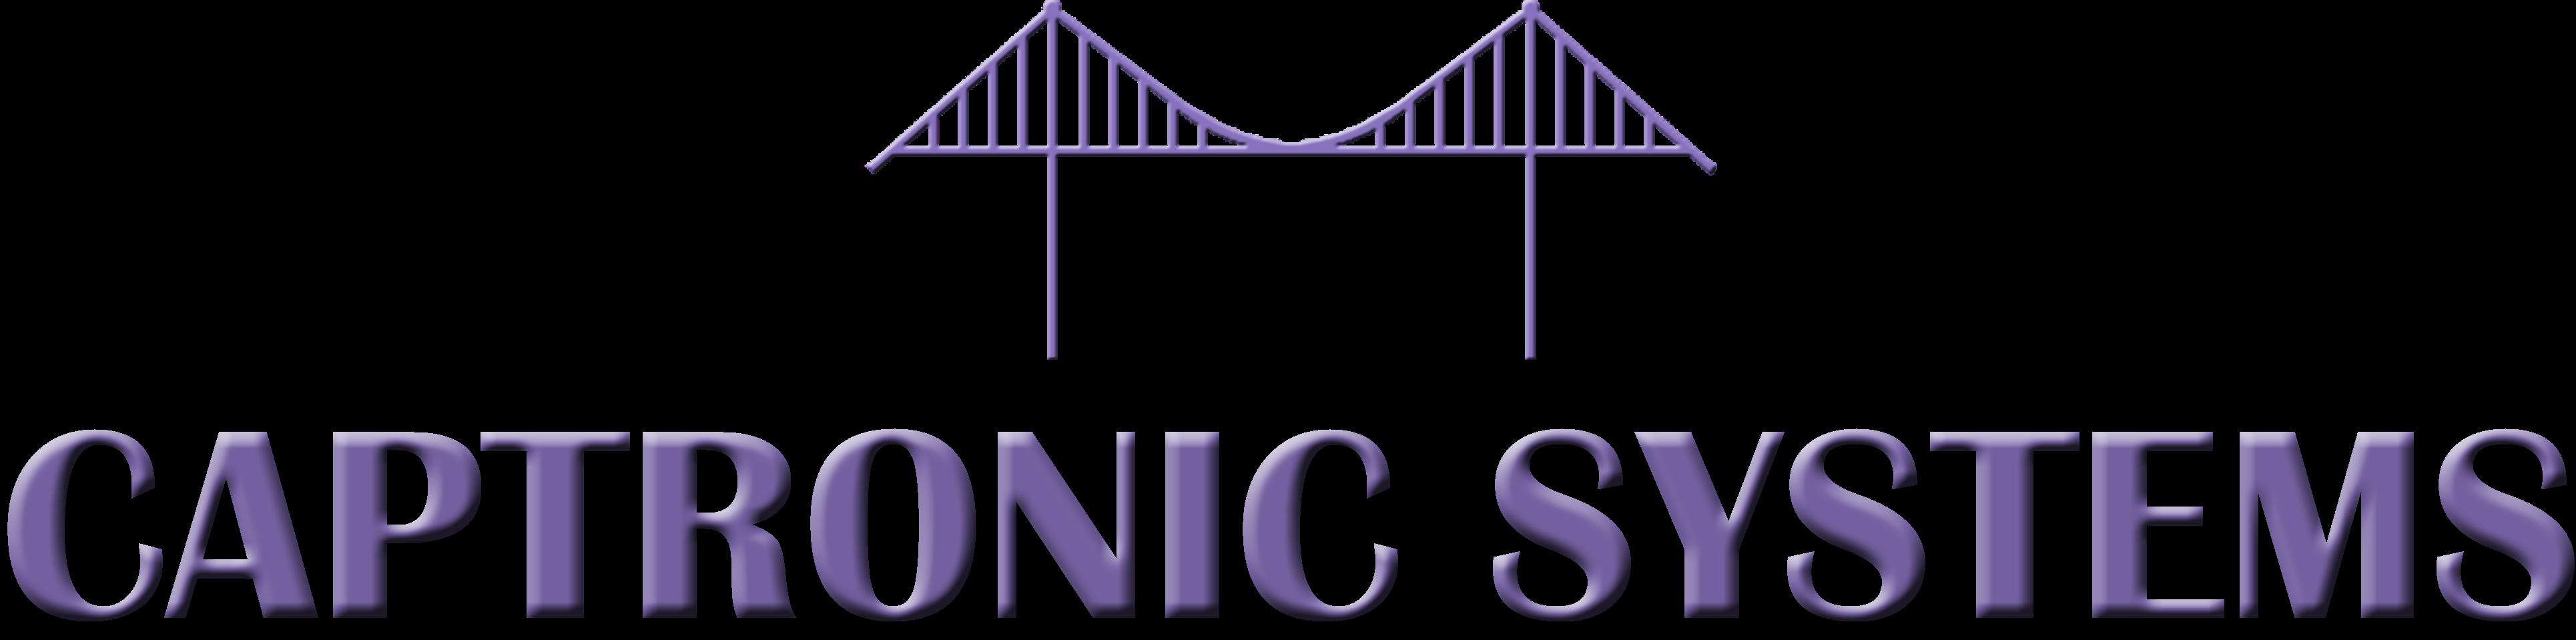 Captronic Systems Pvt. Ltd.